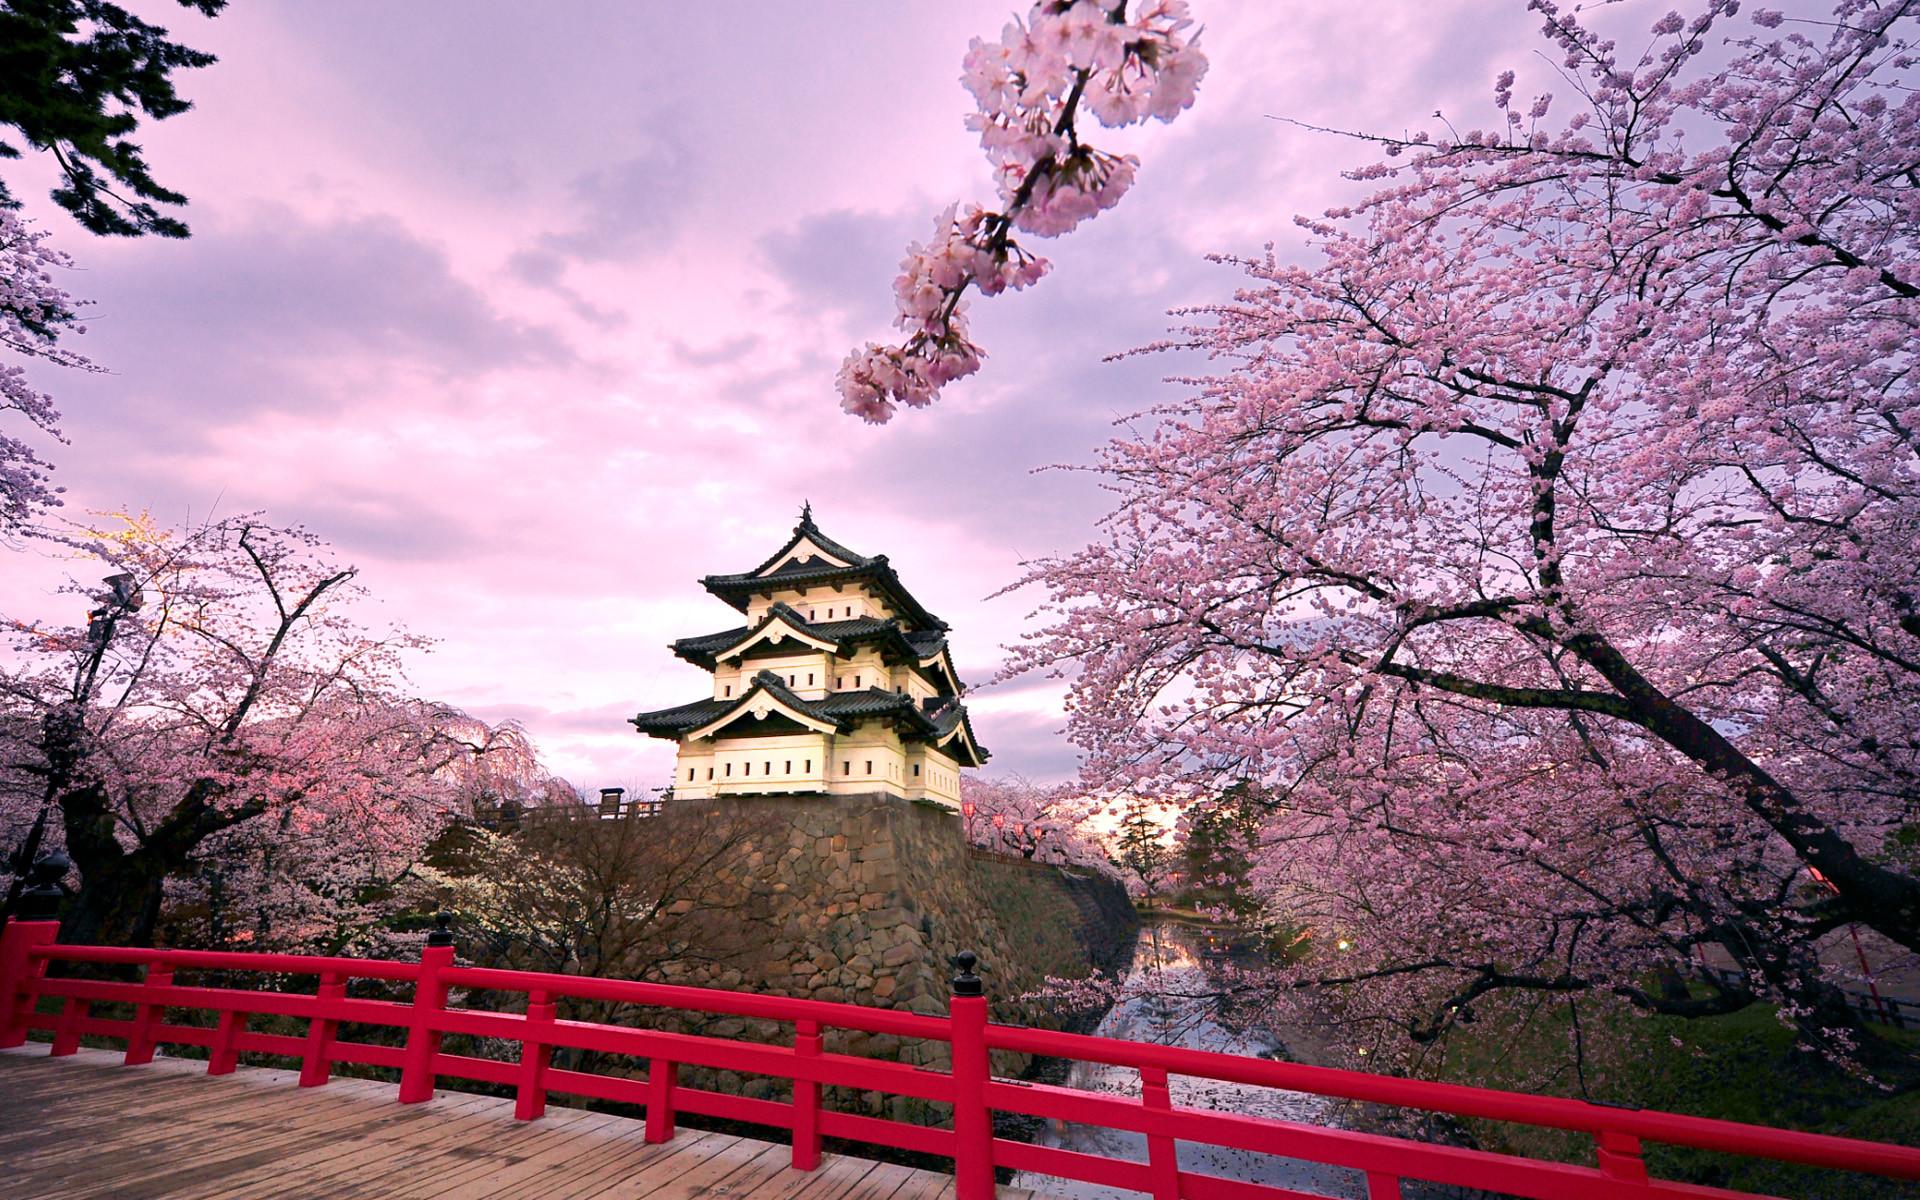 Hirosaki Castle Japan Wallpapers | HD Wallpapers